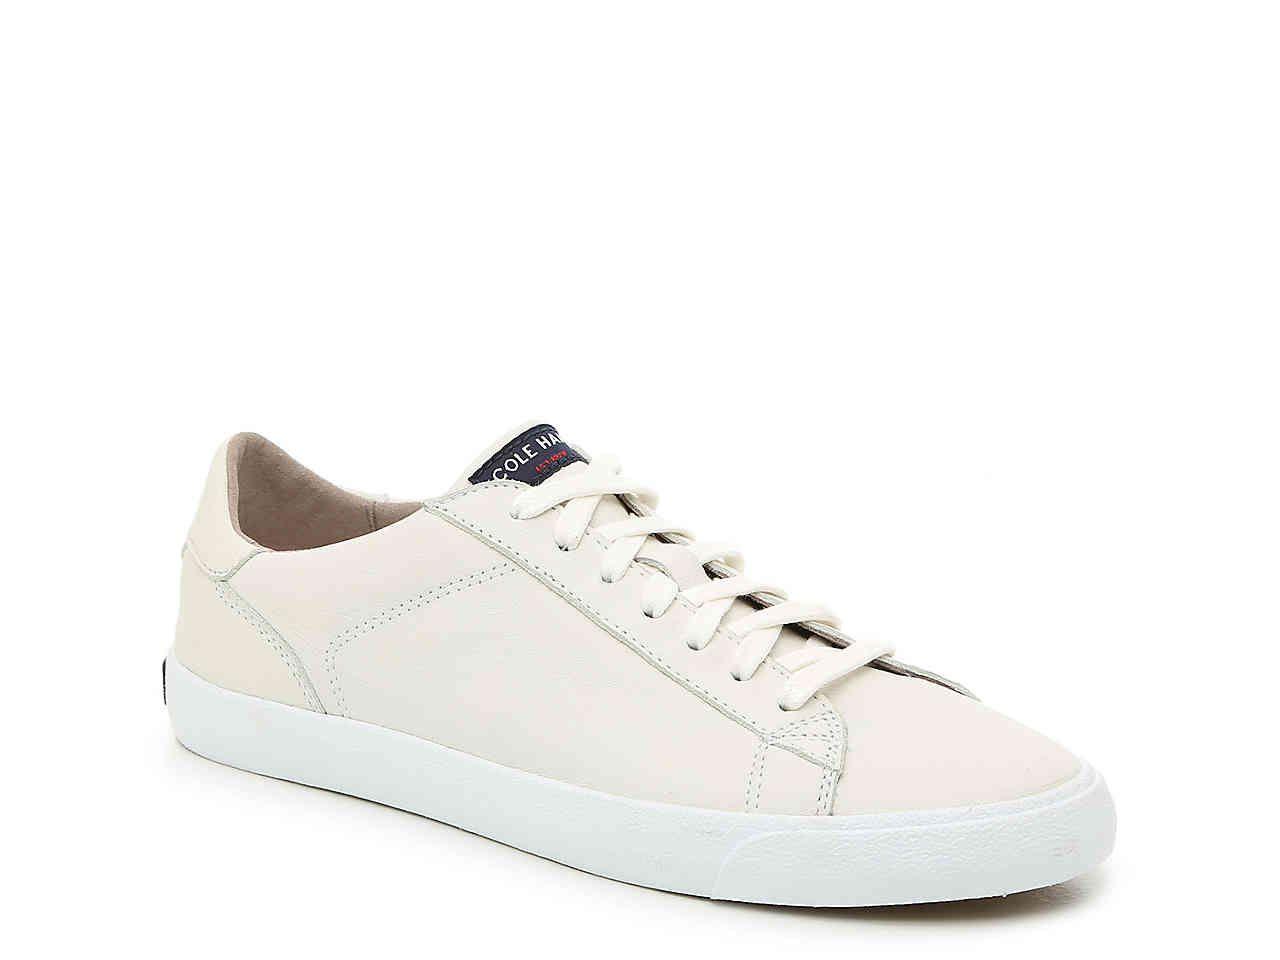 Cole Haan Carrie Sneaker | Sneakers